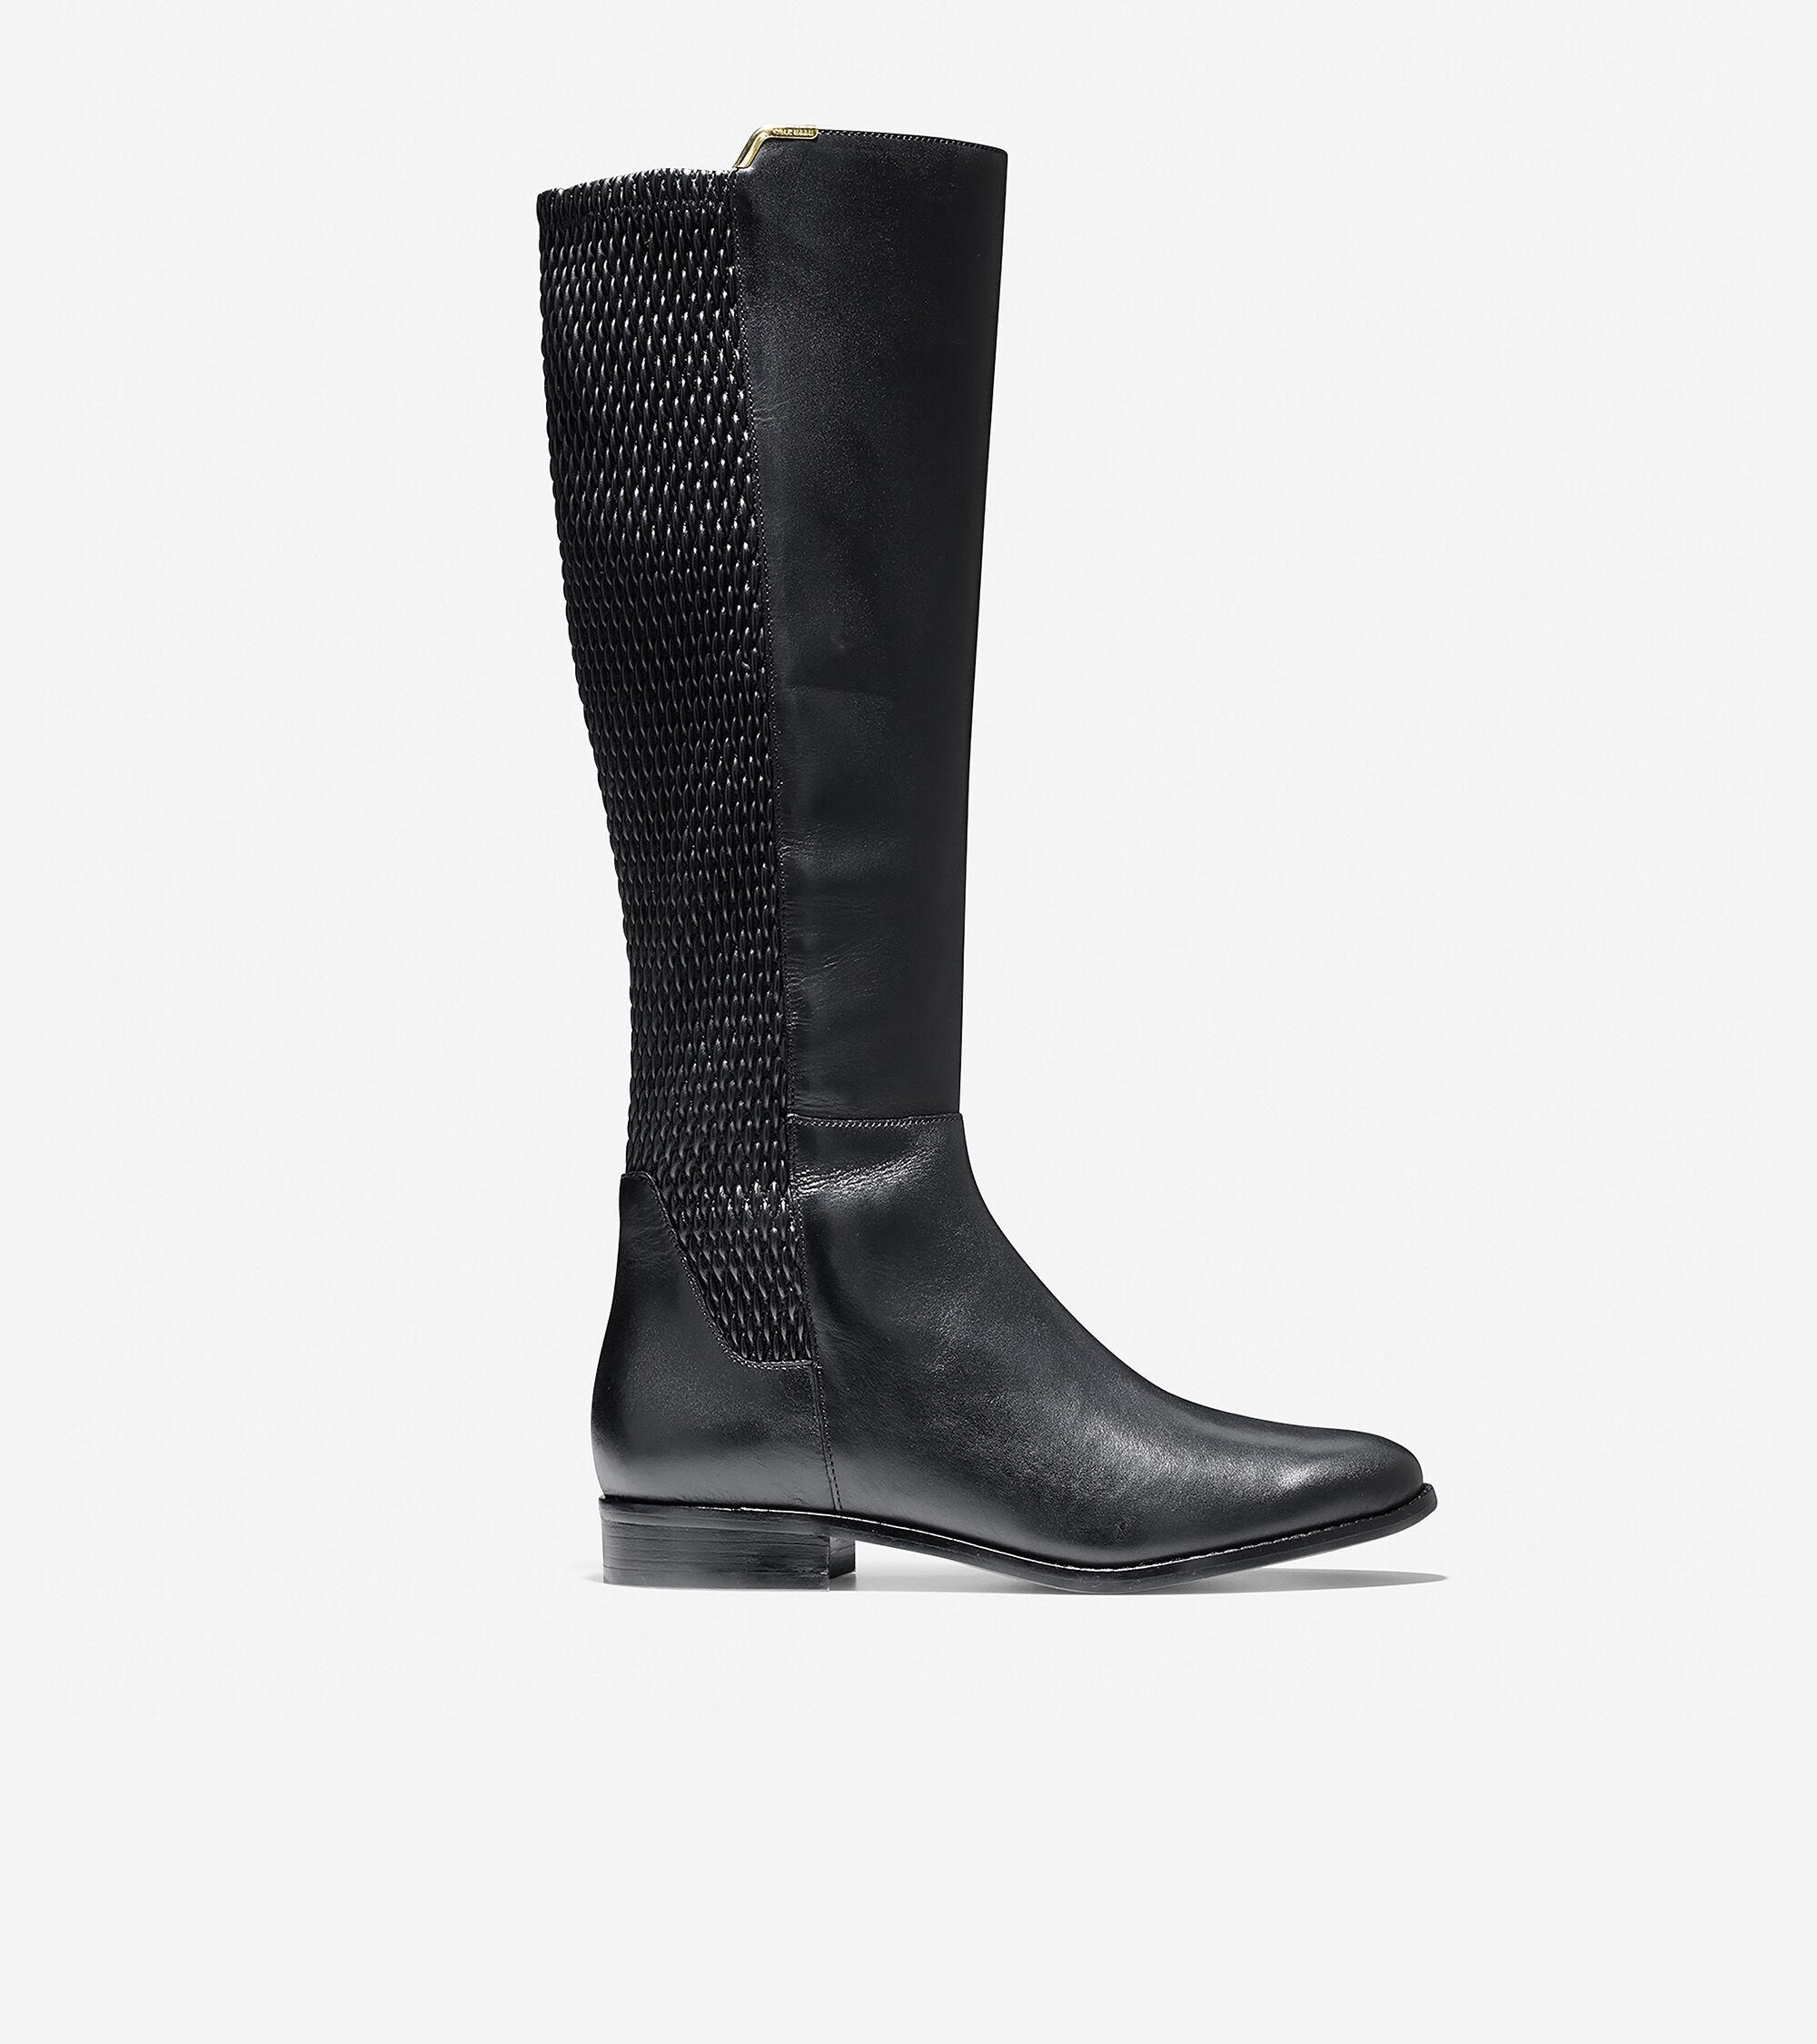 Cole Haan Rockland Boot (Women's) MQalwvHz1V